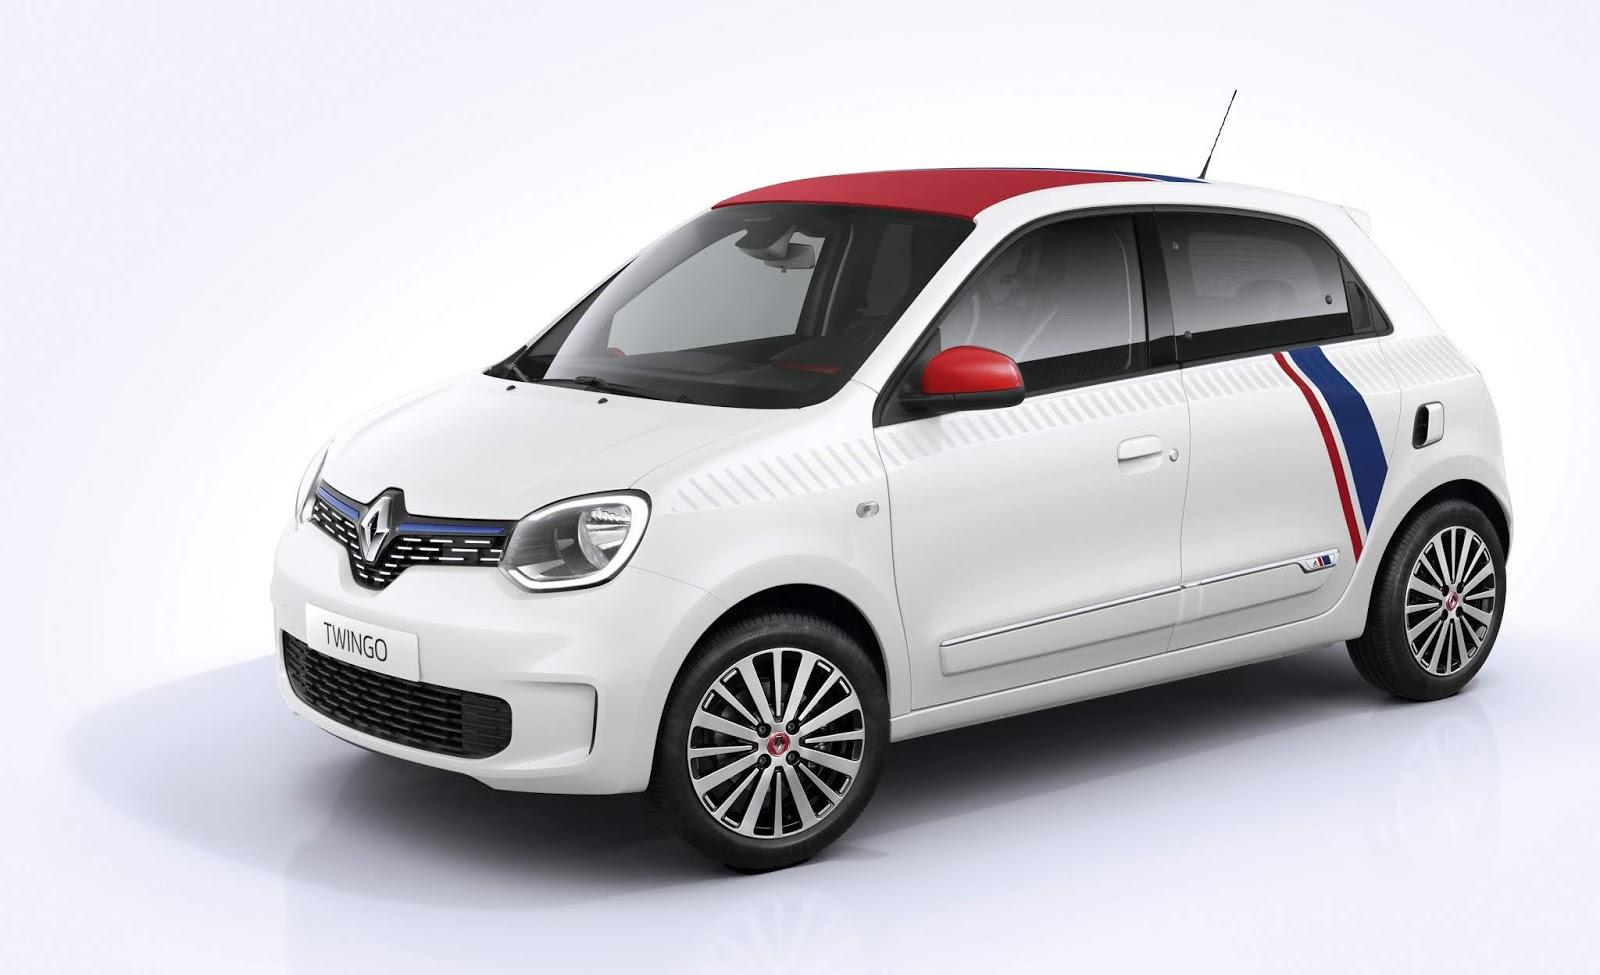 2018 - [Renault] Twingo III restylée - Page 11 2011